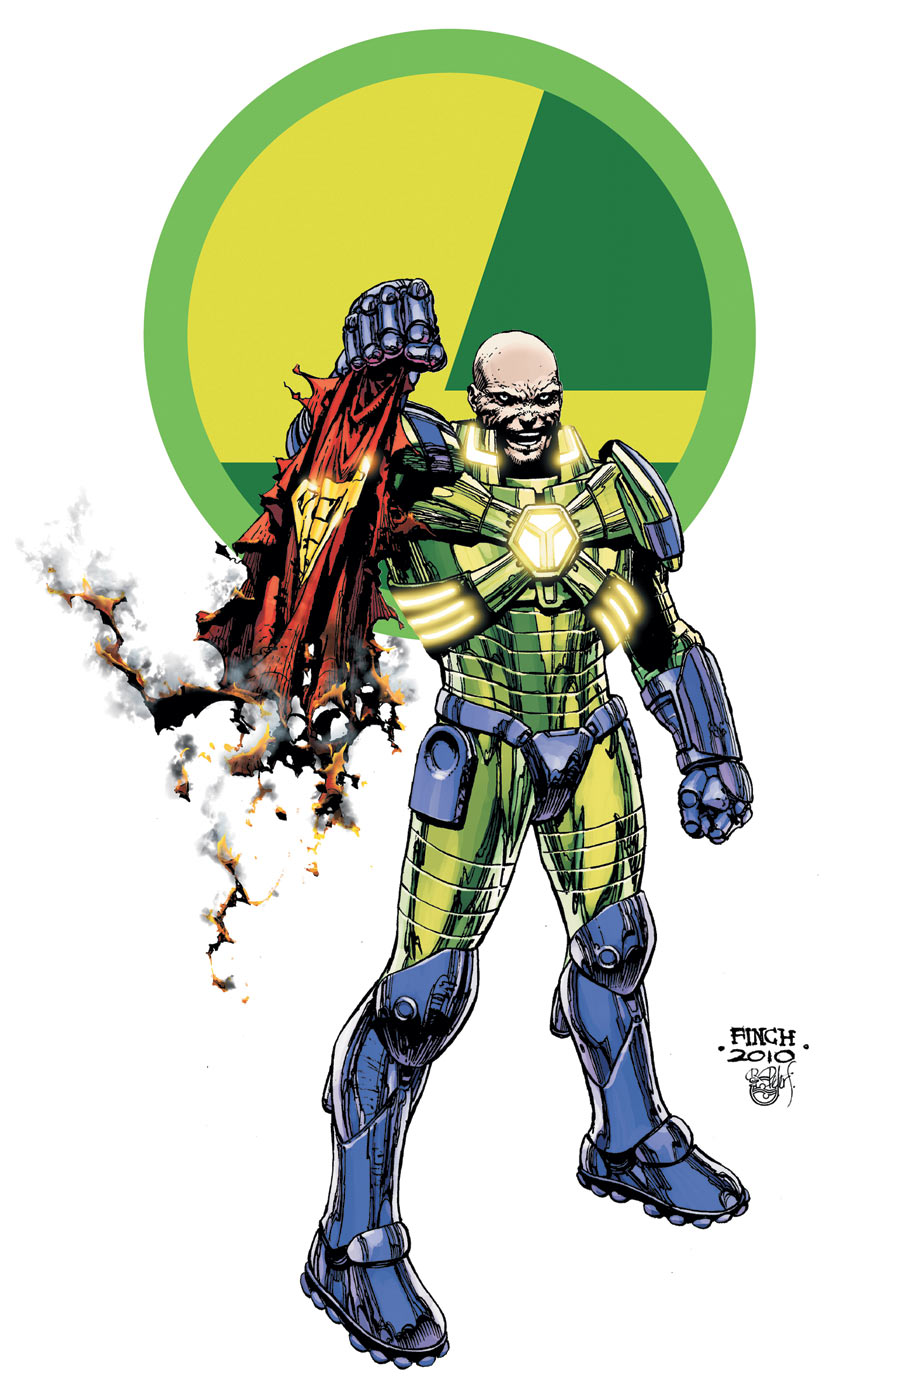 DC COMICS: I SIMBOLI DEGLI EROI (PARTE 3) - SUPERMAN